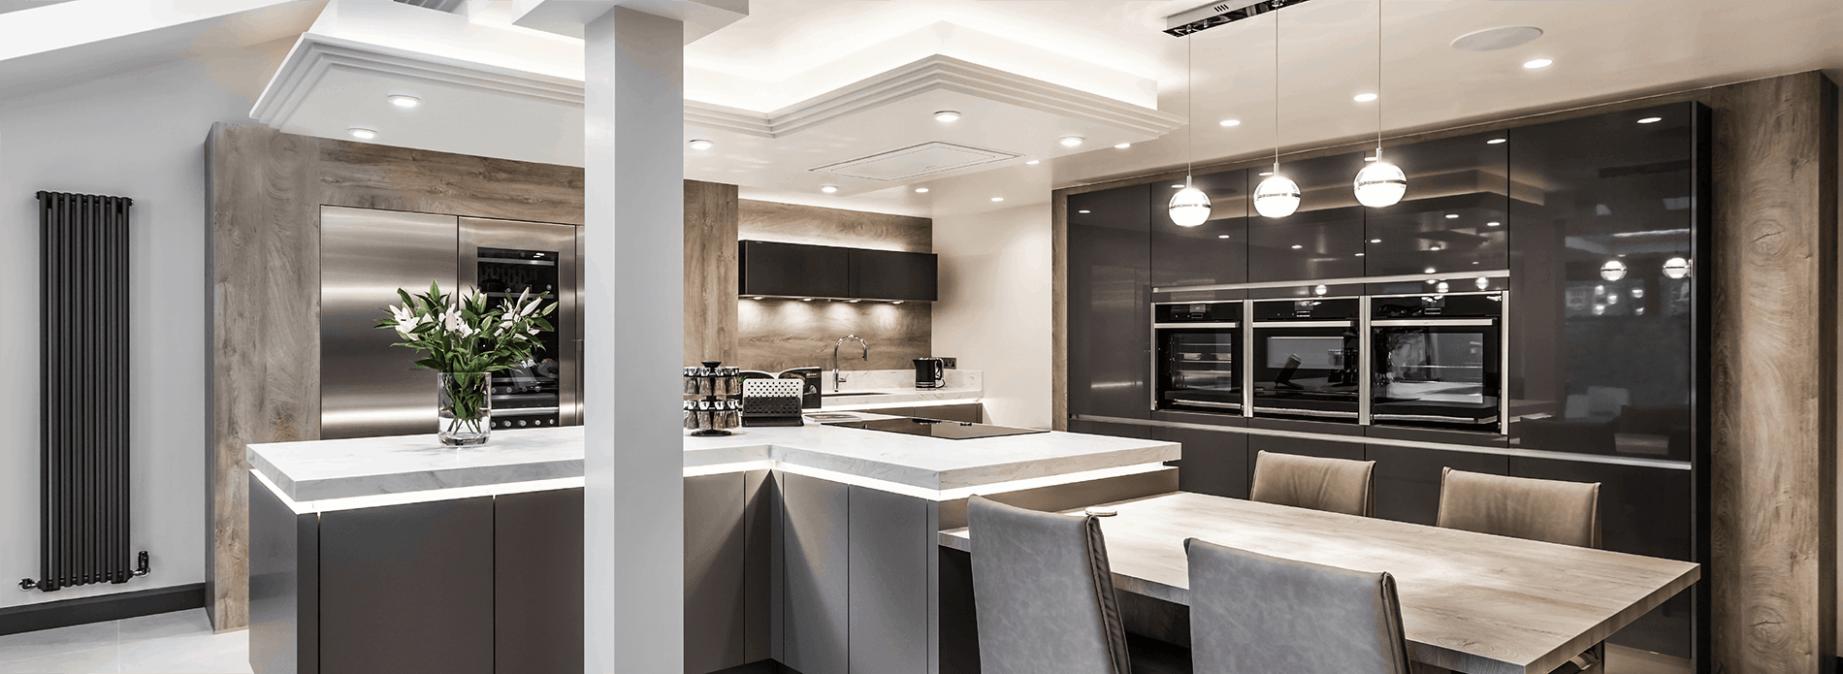 Kitchen Design Centre in 9  Kitchen design centre, Kitchen